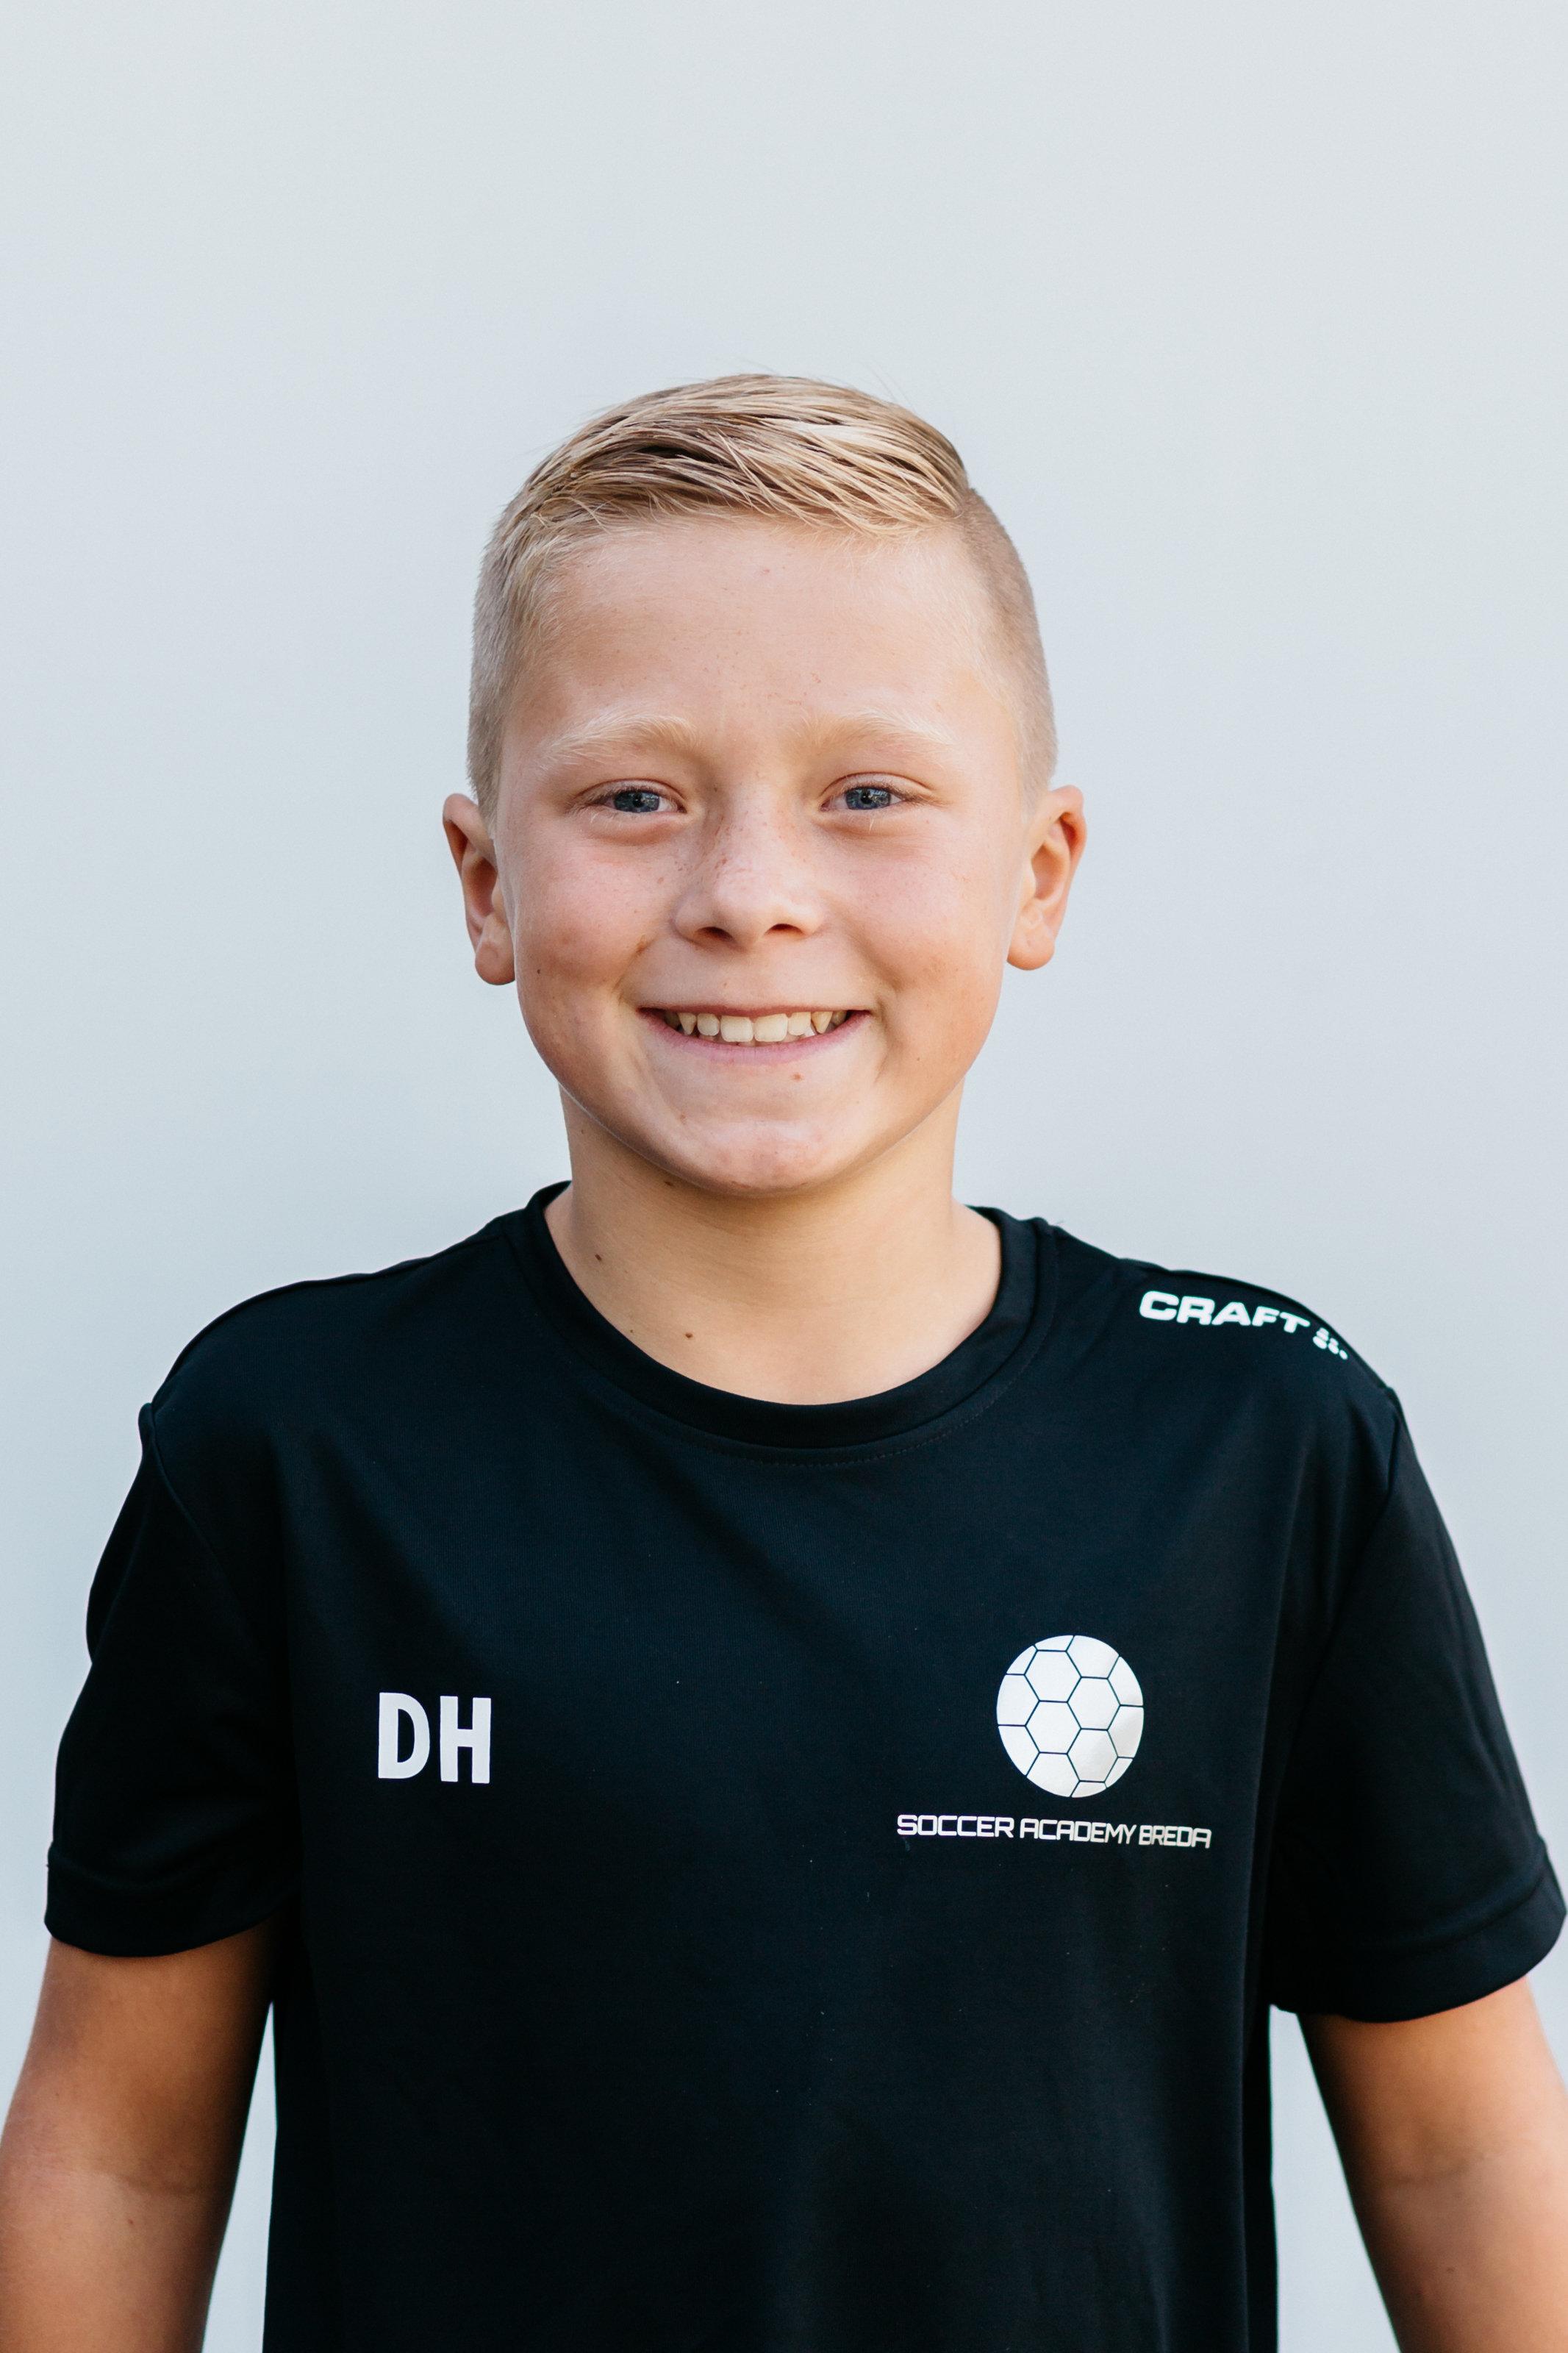 https://socceracademybreda.nl/wp-content/uploads/2020/10/delano-haast-teampagina.jpg